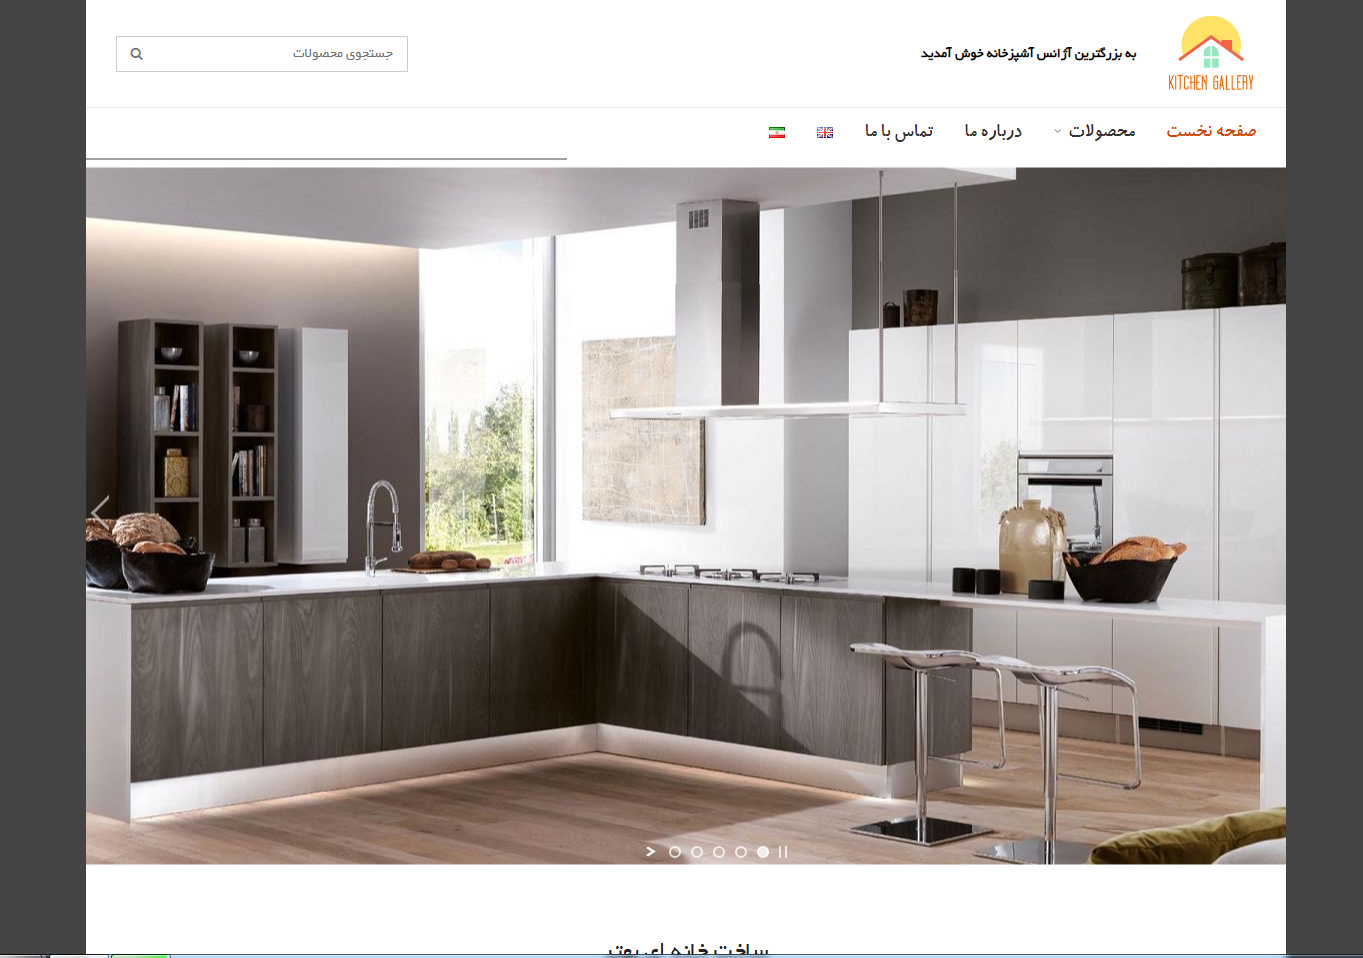 وبسایت kitchen gallery